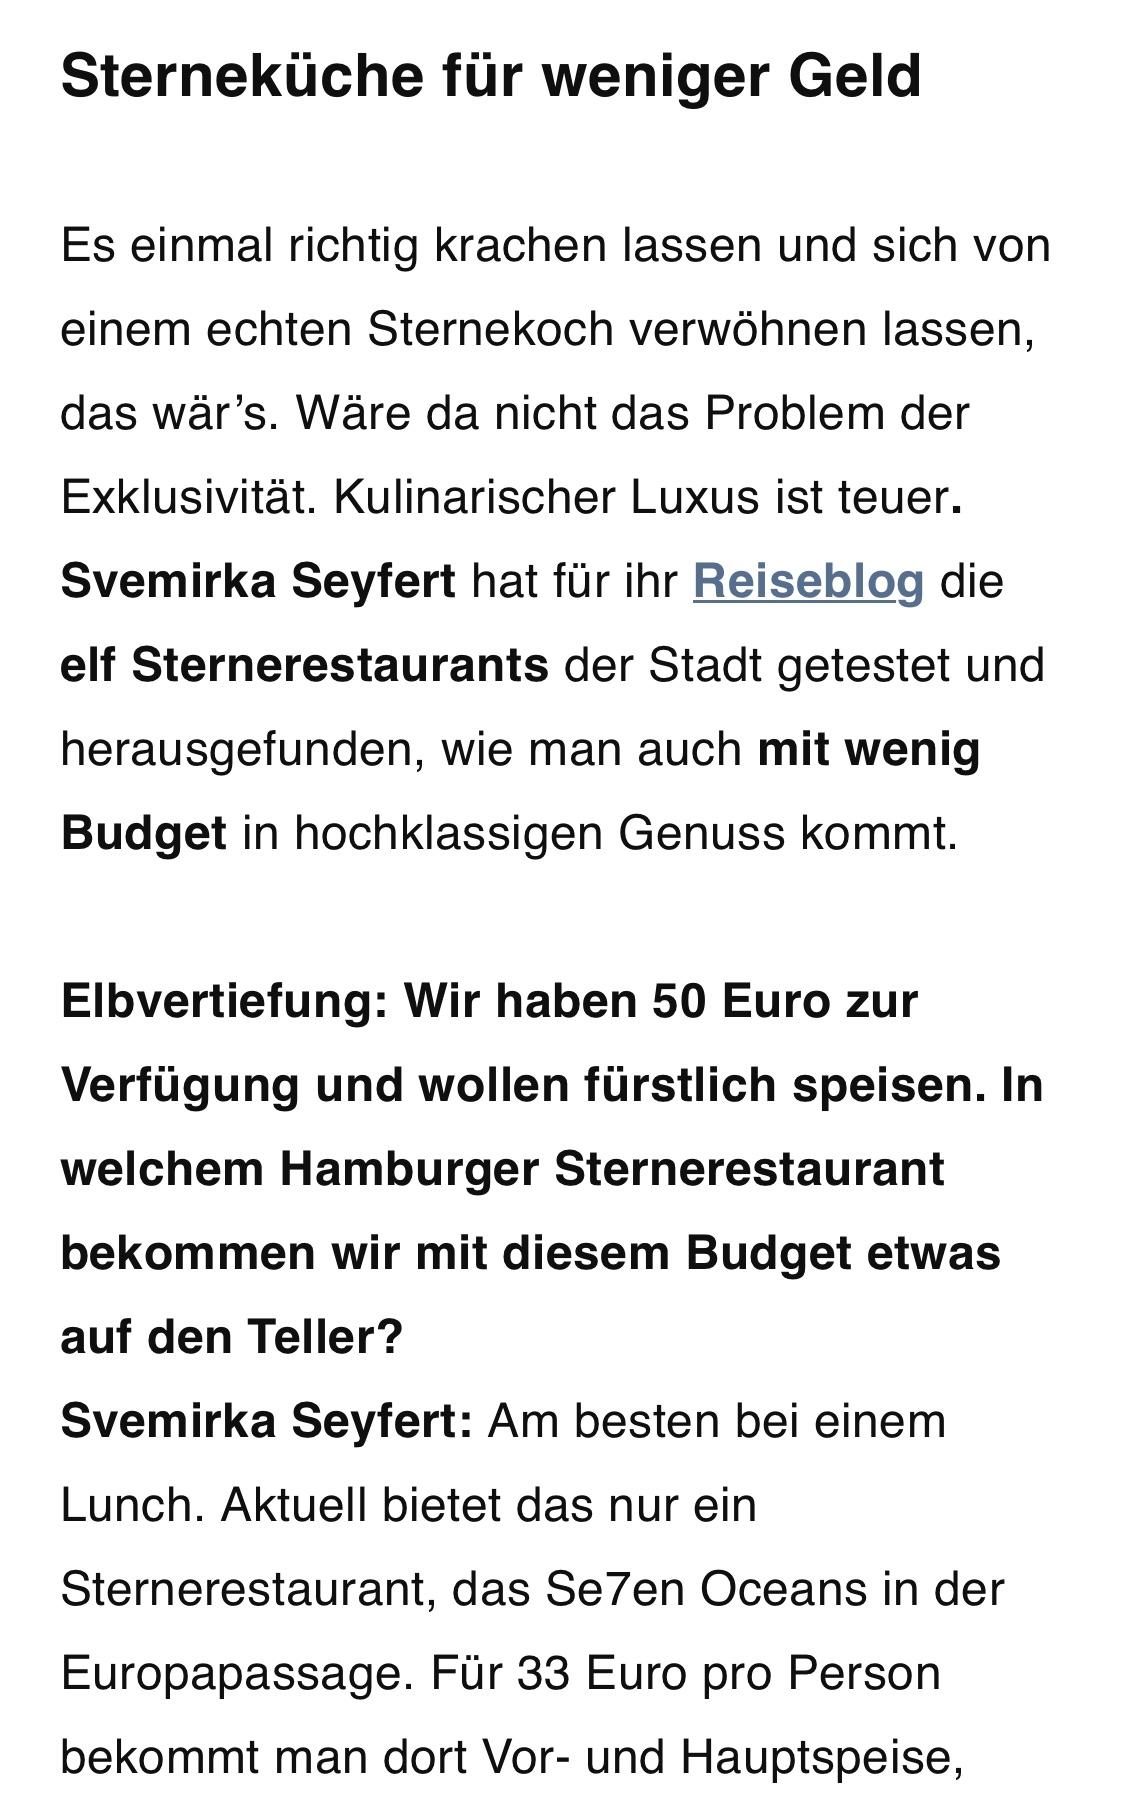 ZEIT Elbvertiefung Interview Svemirka Seyfert 161018